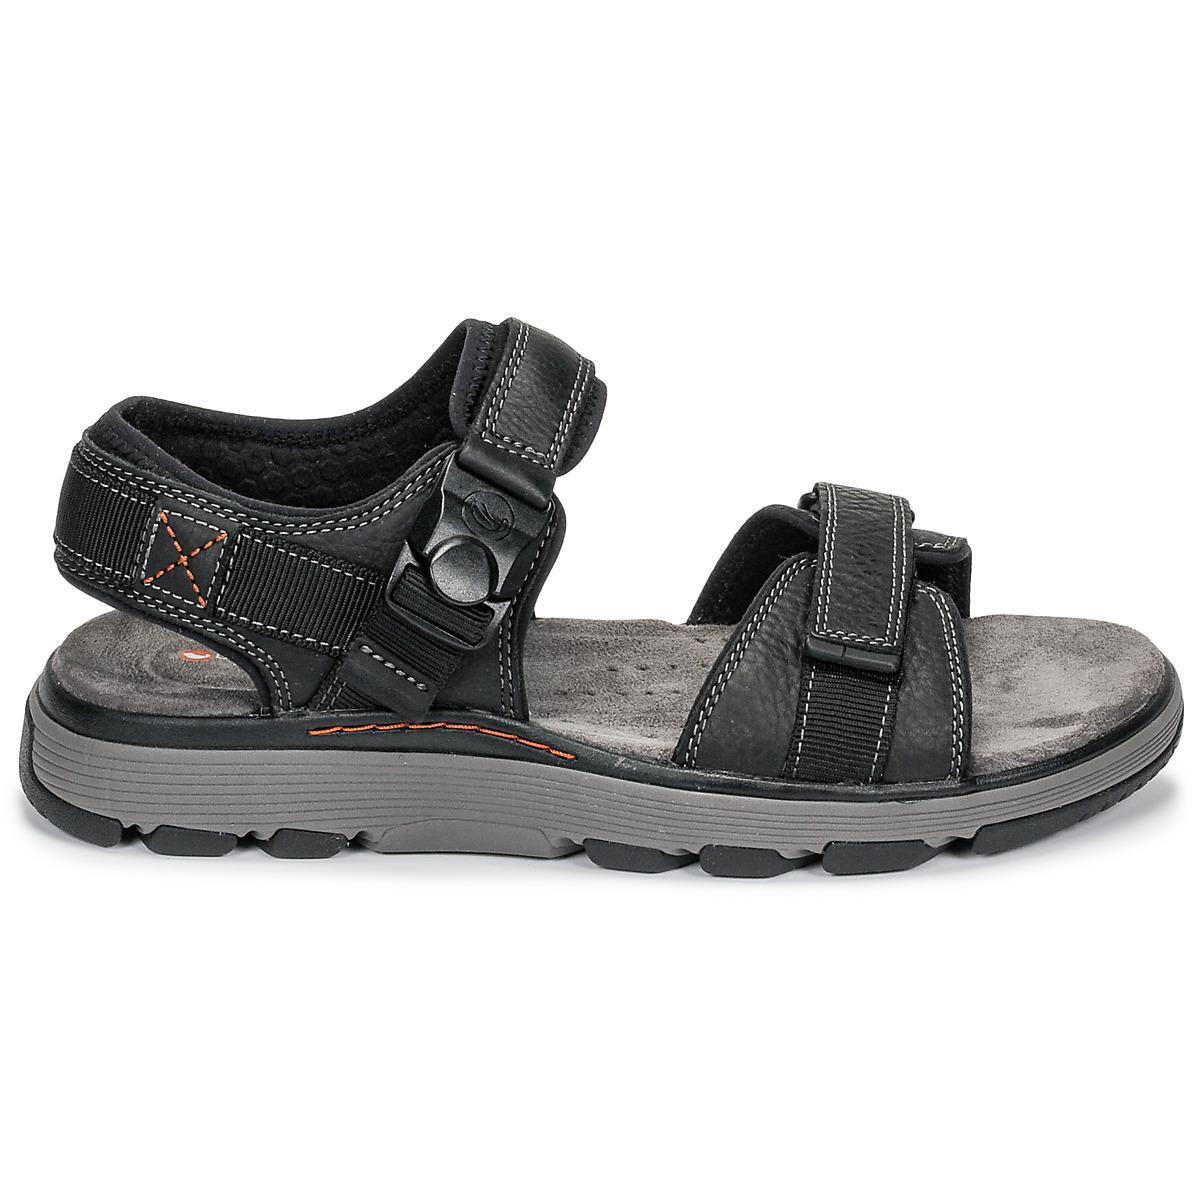 a09278012555 Clarks - Black Un Trek Part Sandals for Men - Lyst. View fullscreen